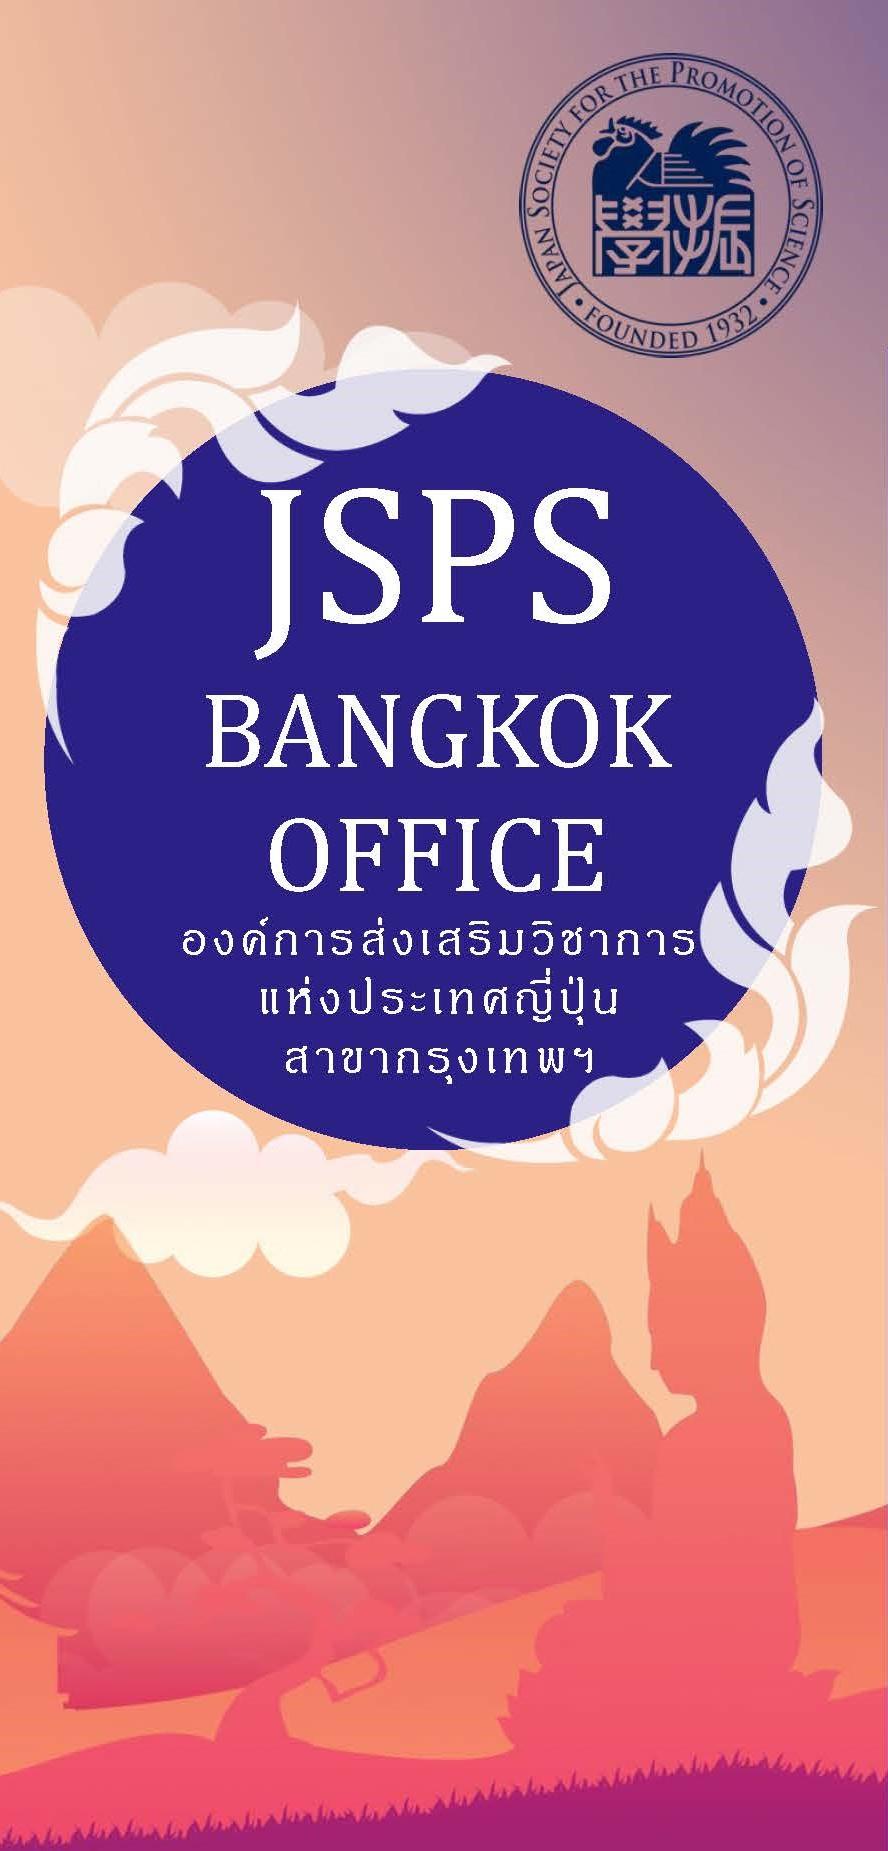 JSPSバンコク研究連絡センターの案内(タイ語版)